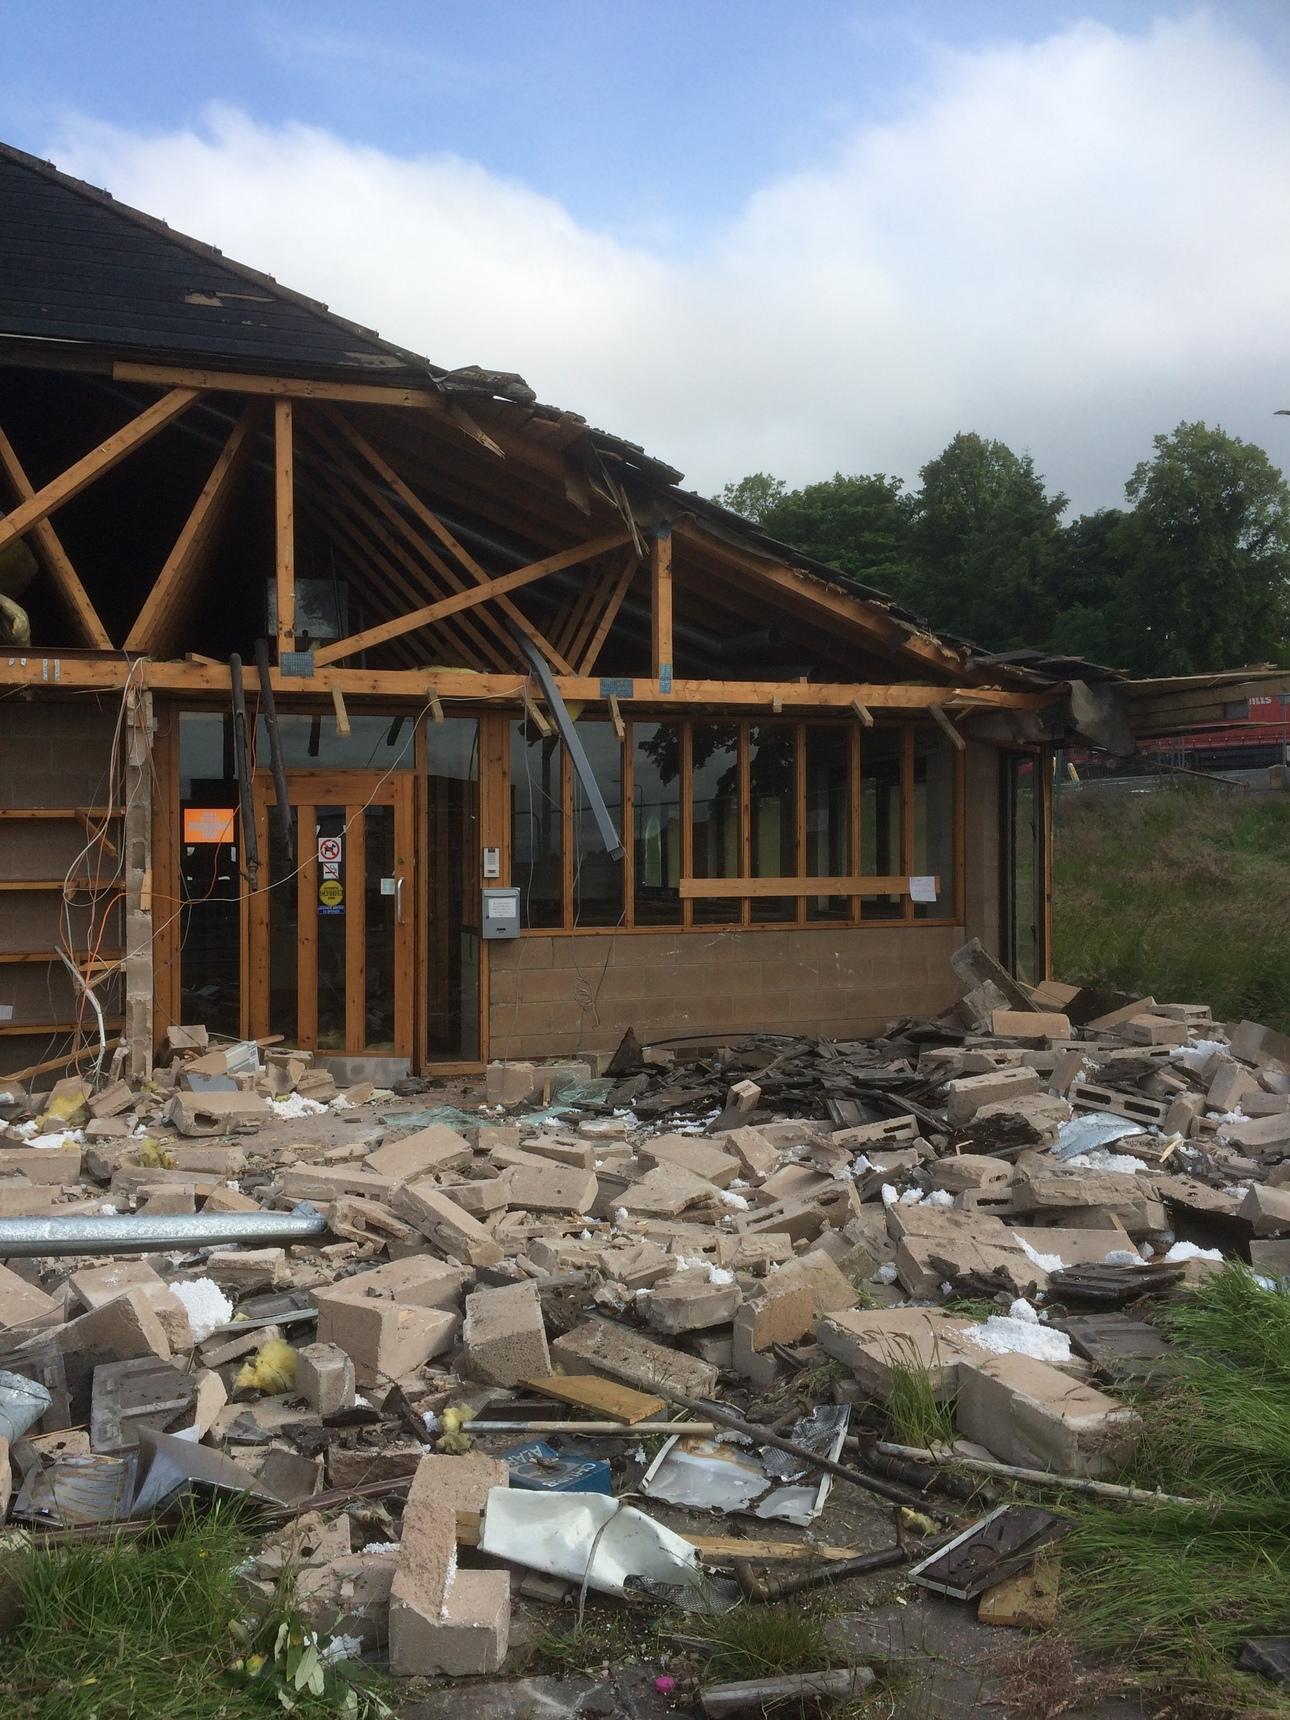 Oxgangs Path Surgery being demolished